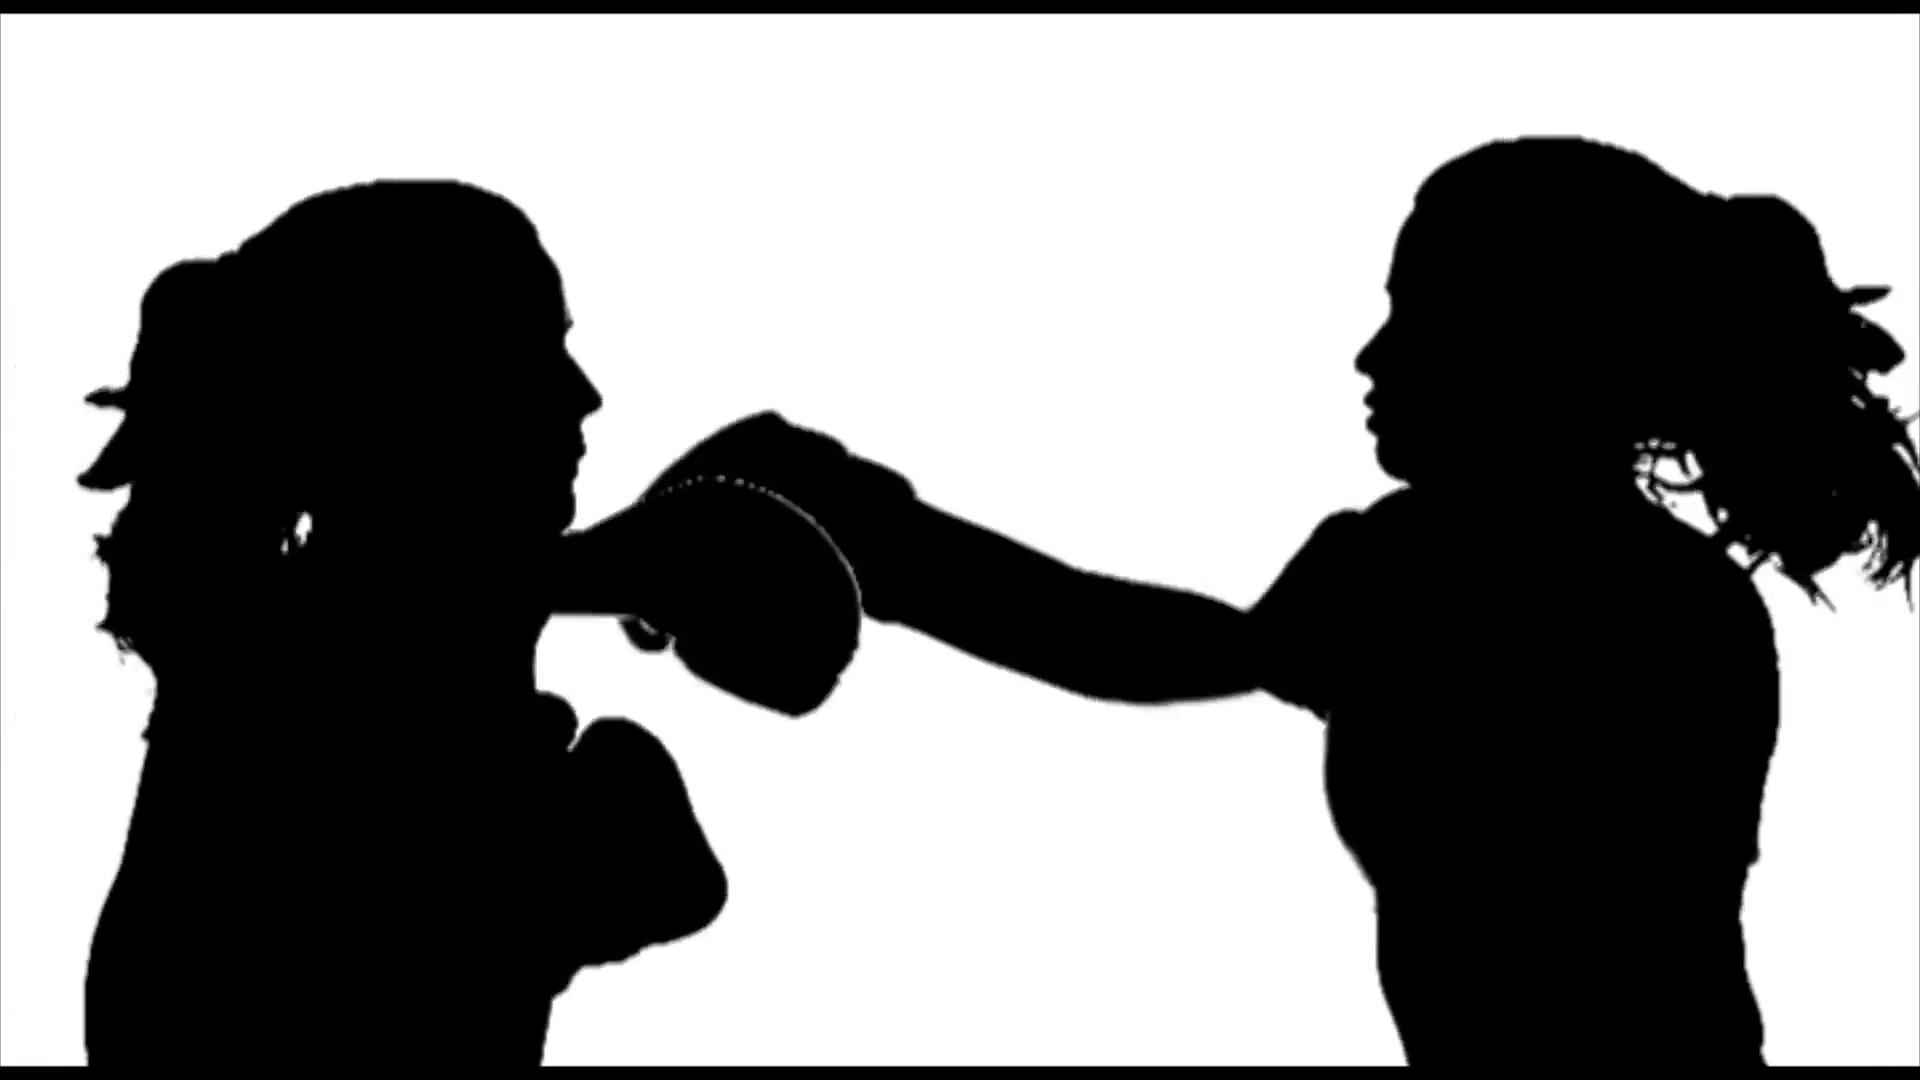 two-women-boxing-fight-silhouette_e16dghod__F0001